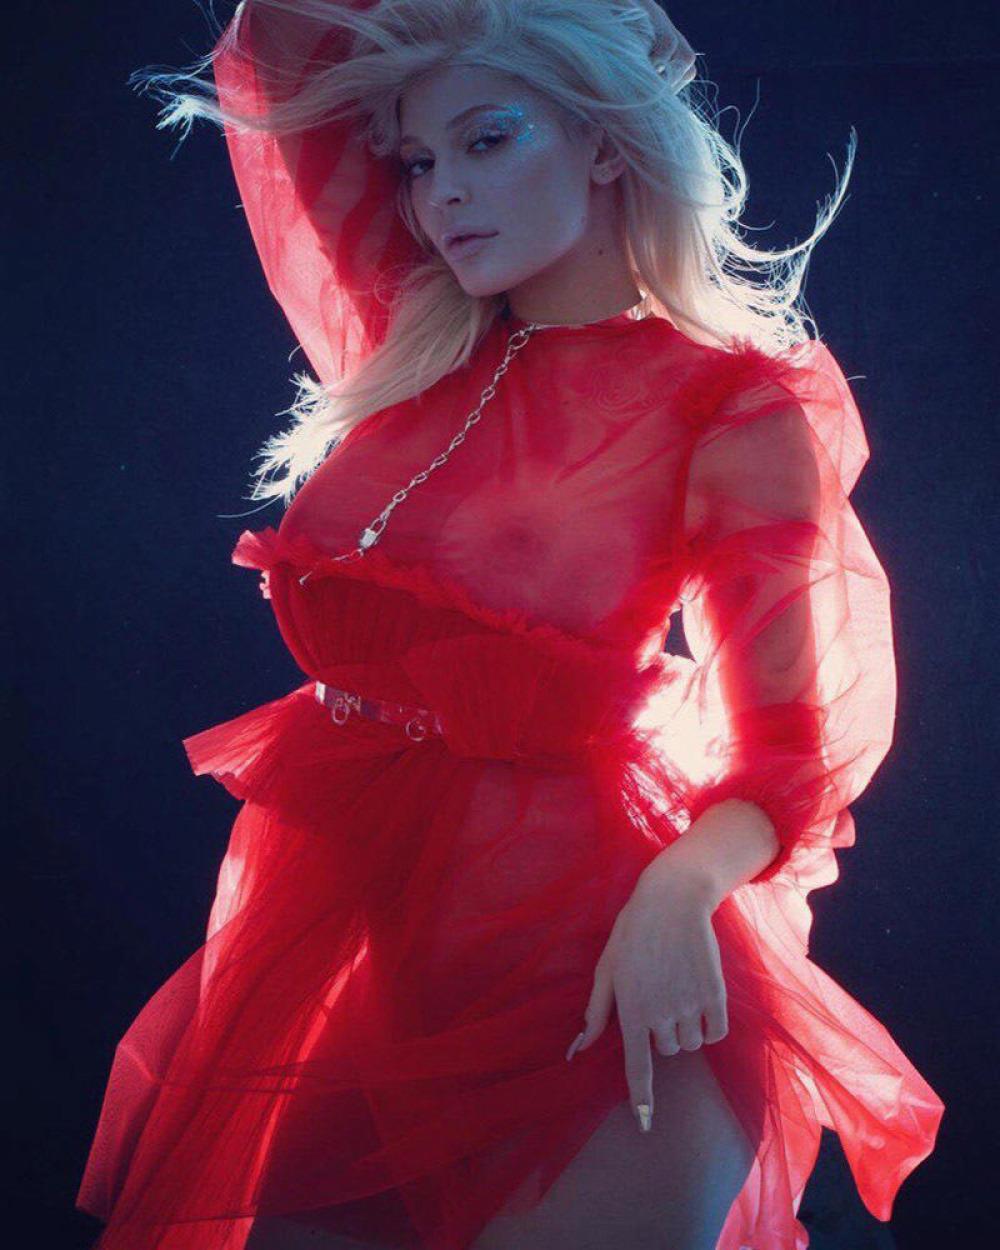 Kylie Jenner V magazine